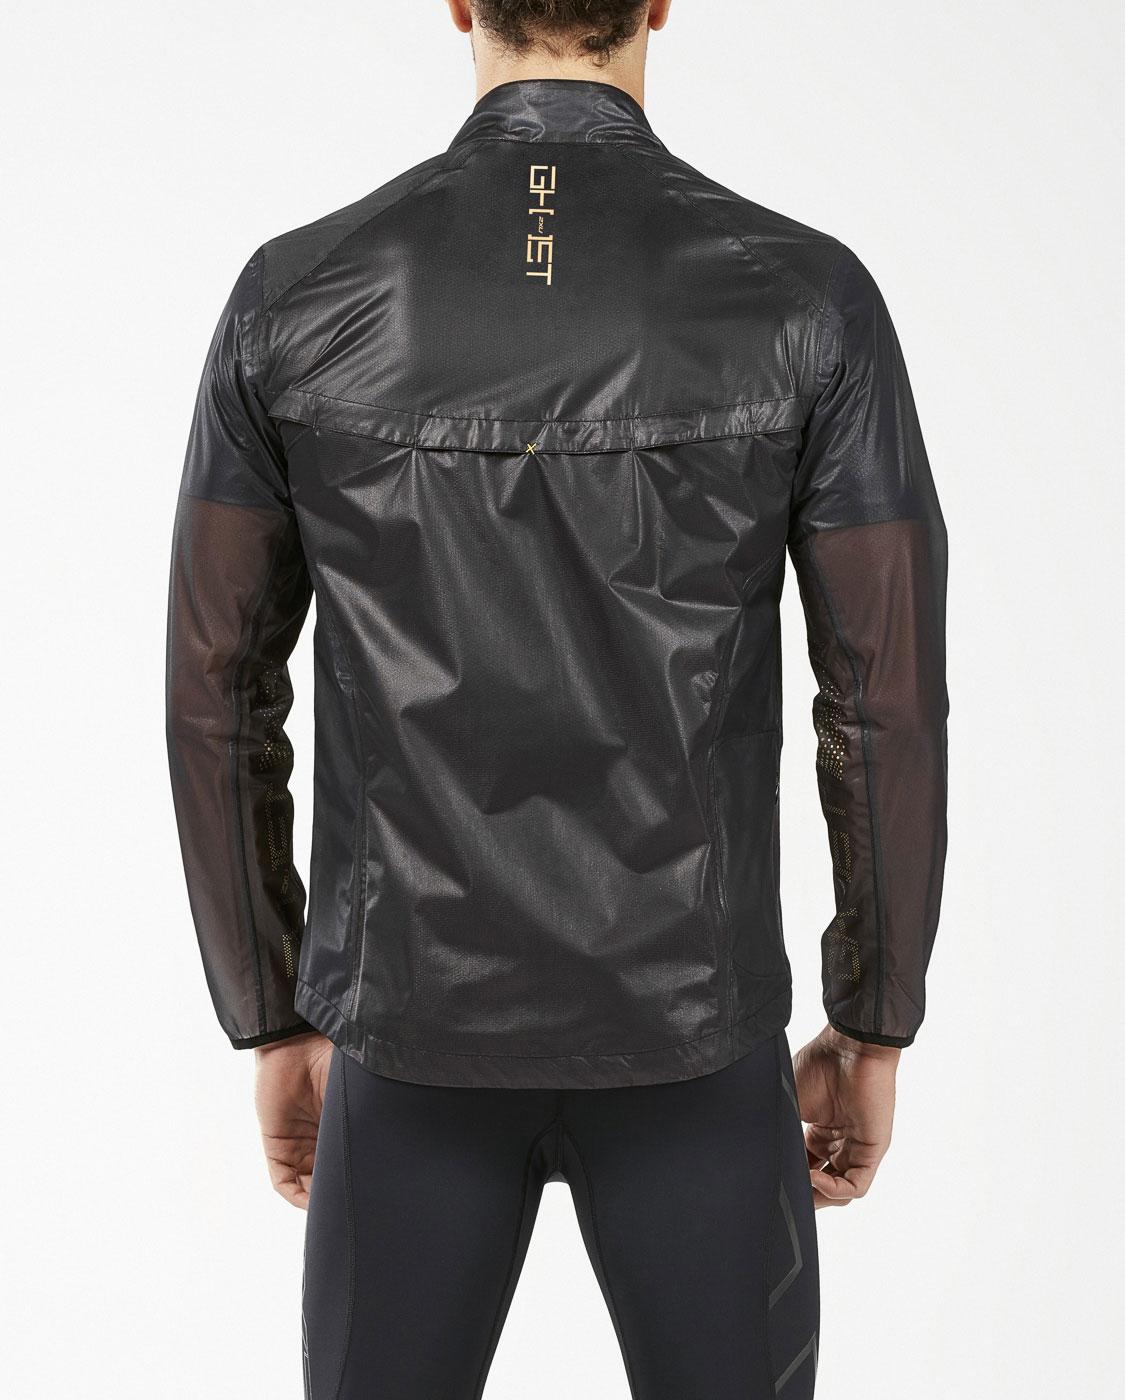 78a2b004 NEW 2XU GHST Membrane Jacket Mens | eBay